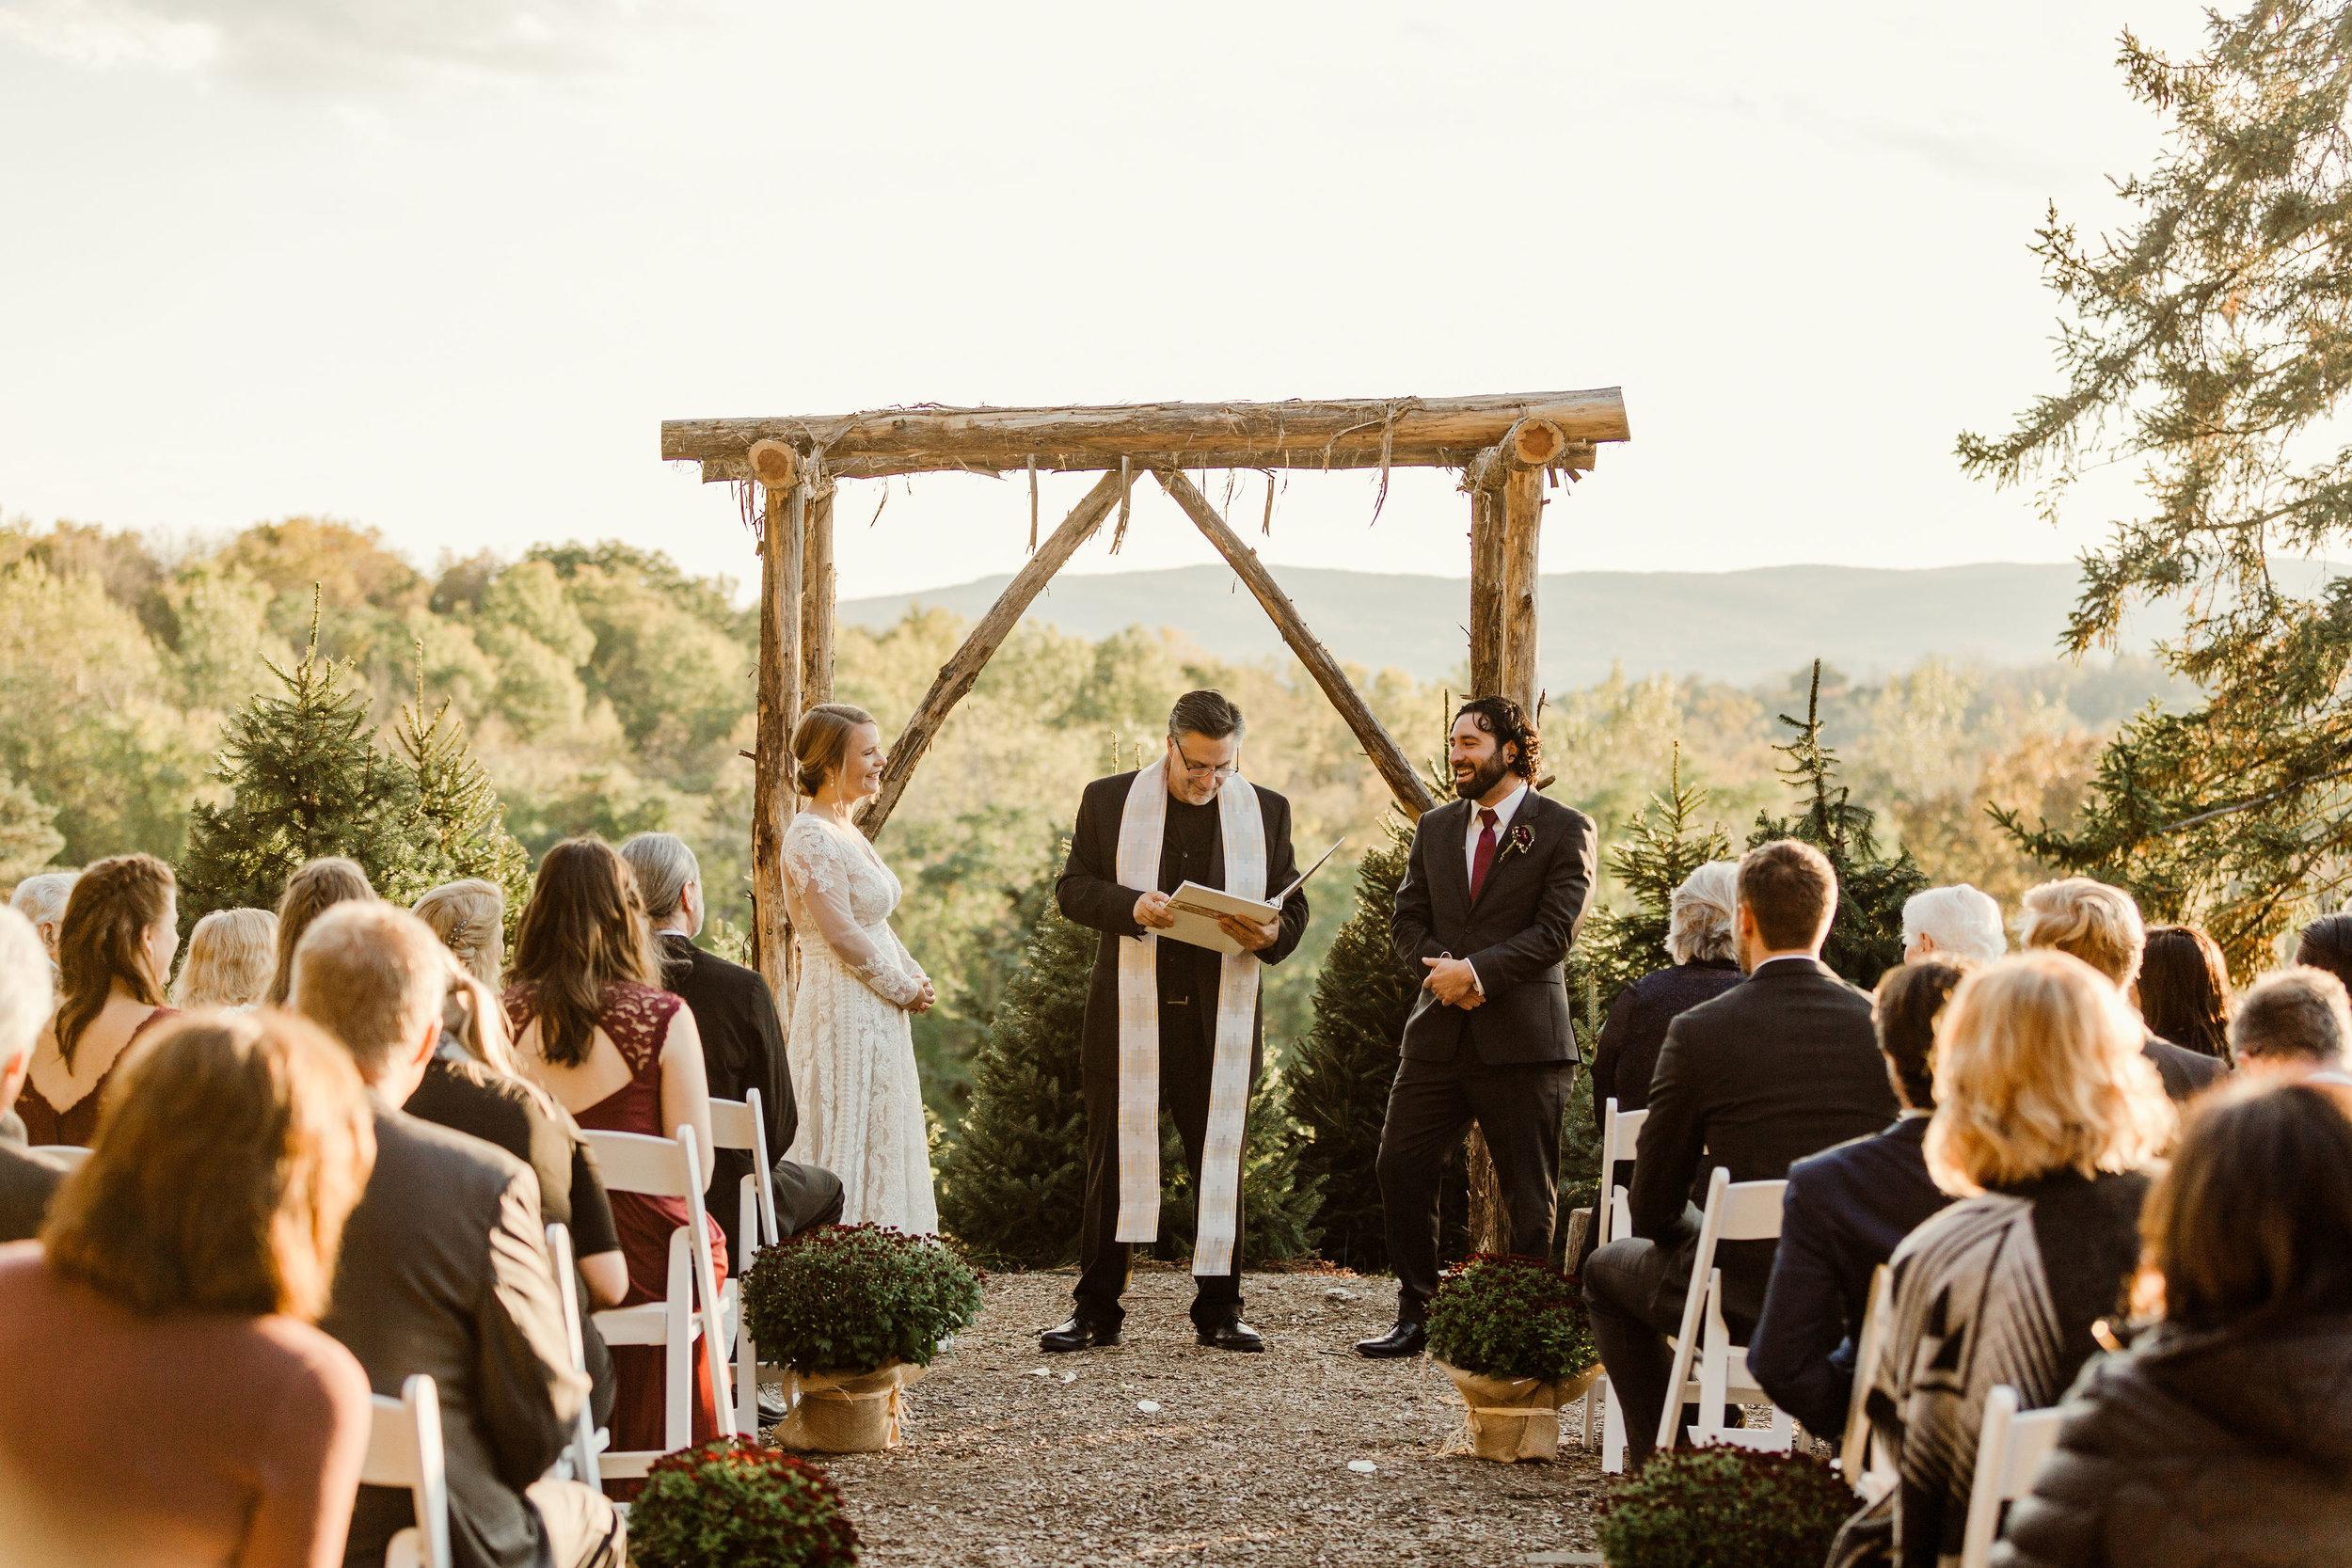 young-love-media-rustic-fall-autumn-wedding-emmerich-tree-farm-hudson-valley-warwick-new-york-ceremony-132.jpg